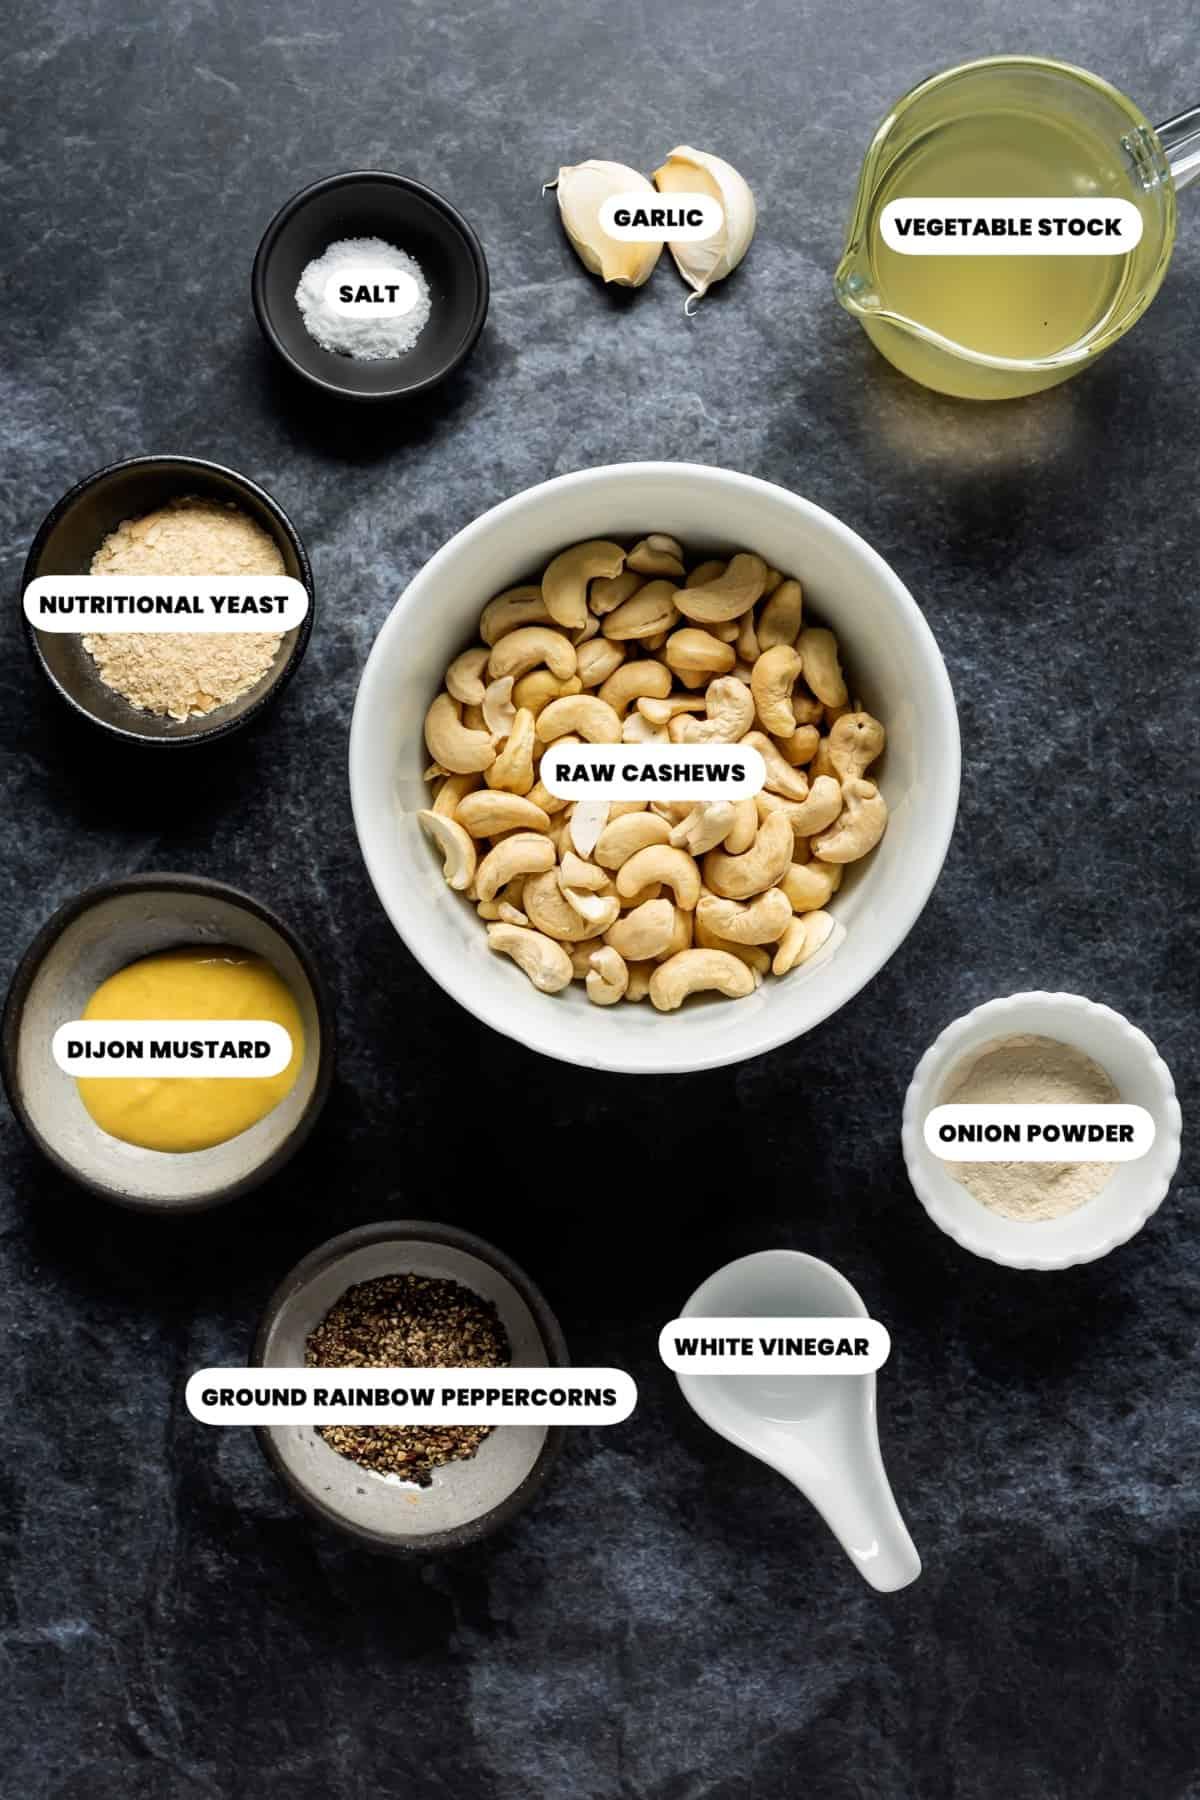 Photo of the ingredients needed to make vegan camembert.